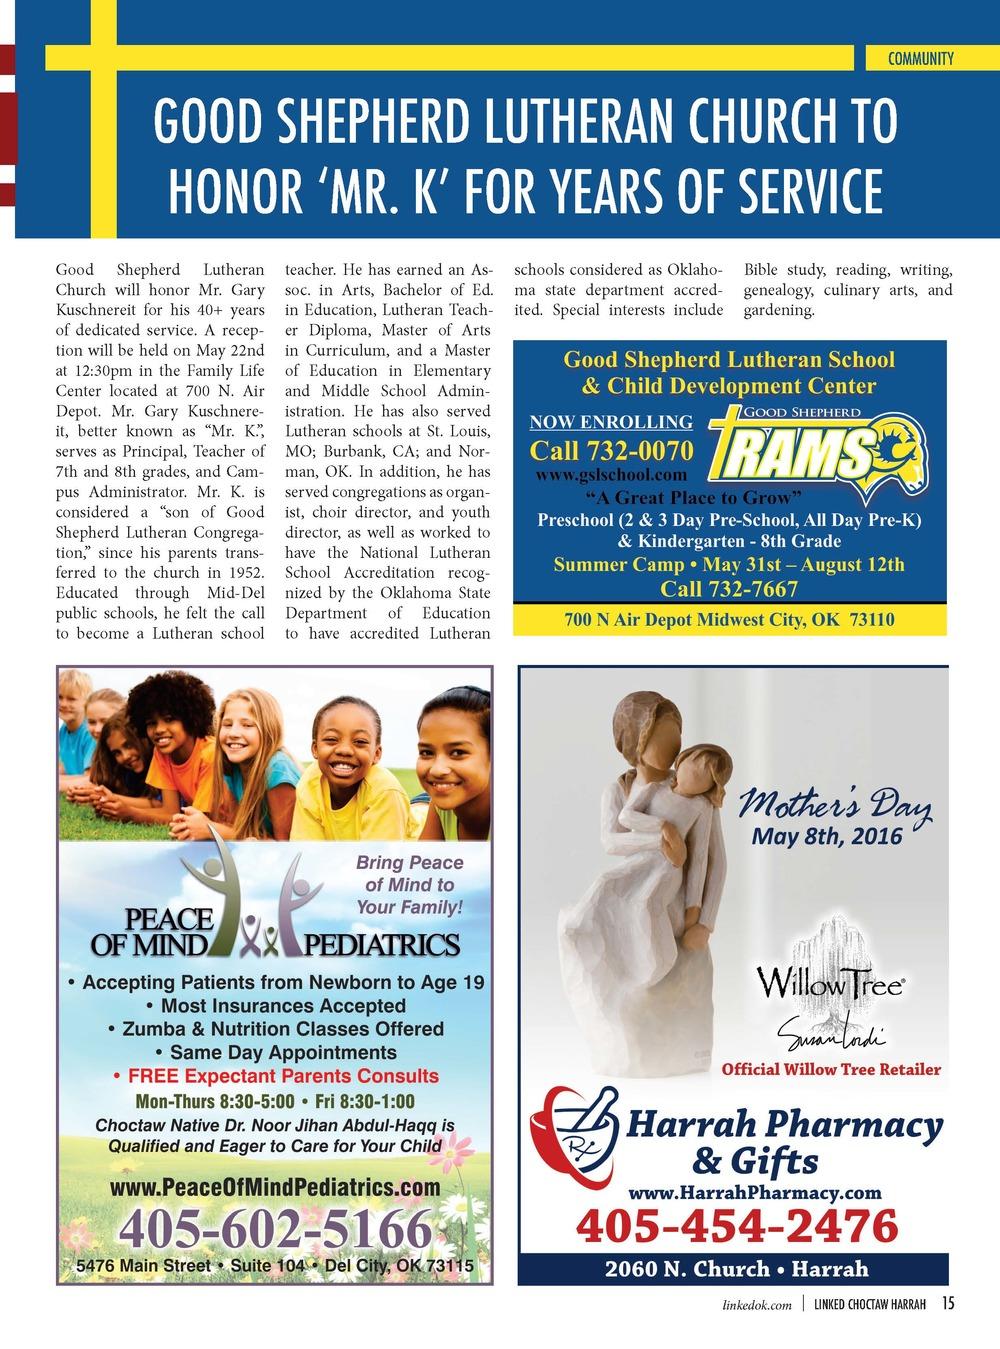 High Five_Choctaw Harrah_April 2016_Page_15.jpg